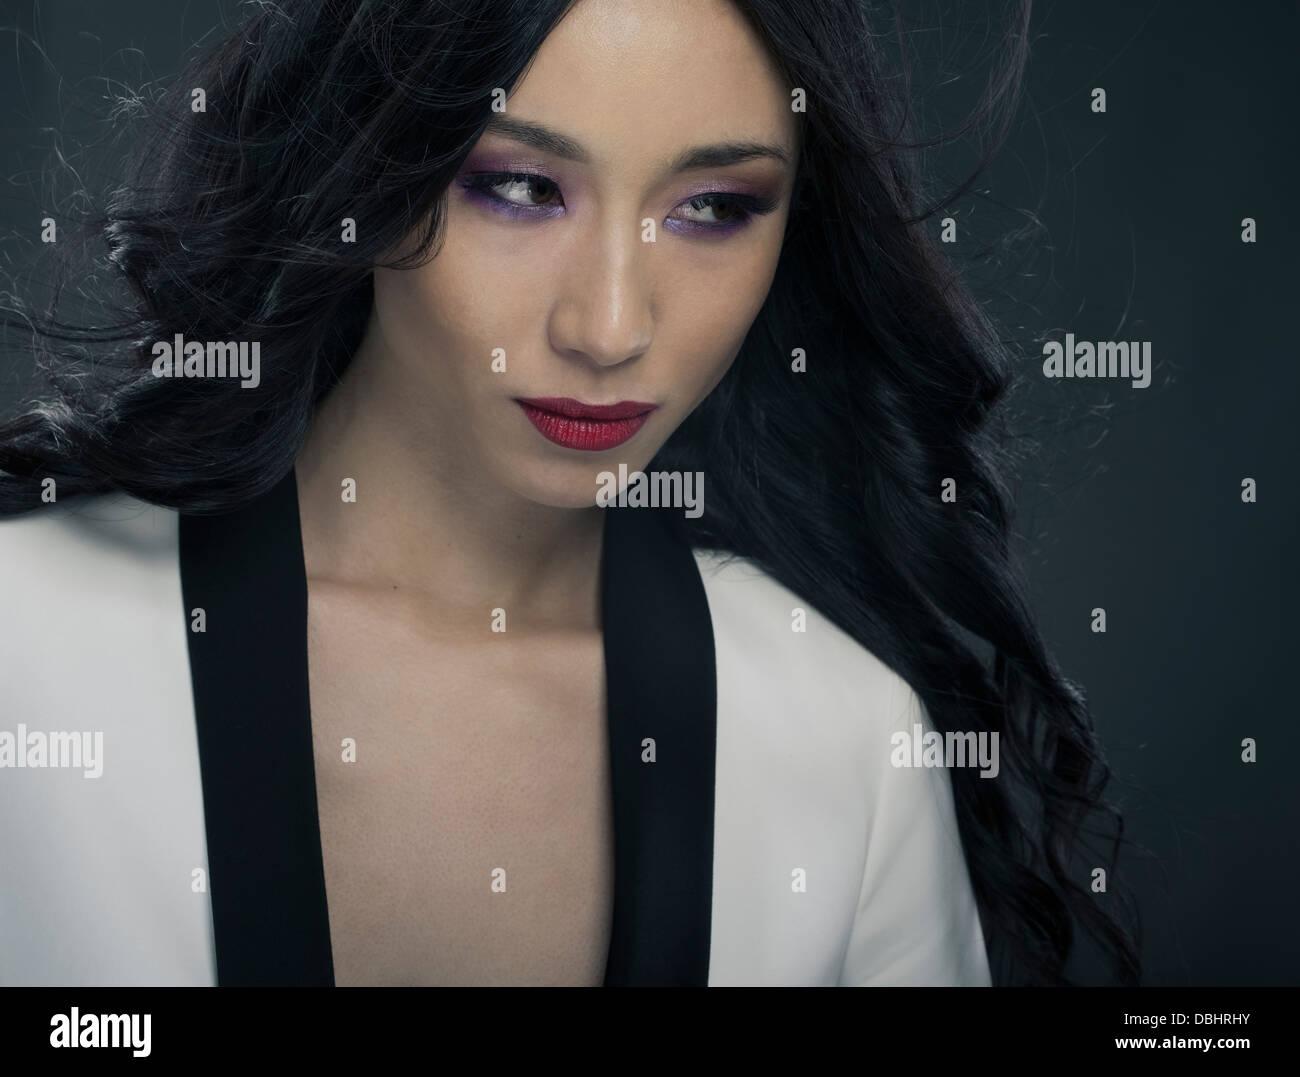 beautiful asian woman in her twenties wearing black and white jacket